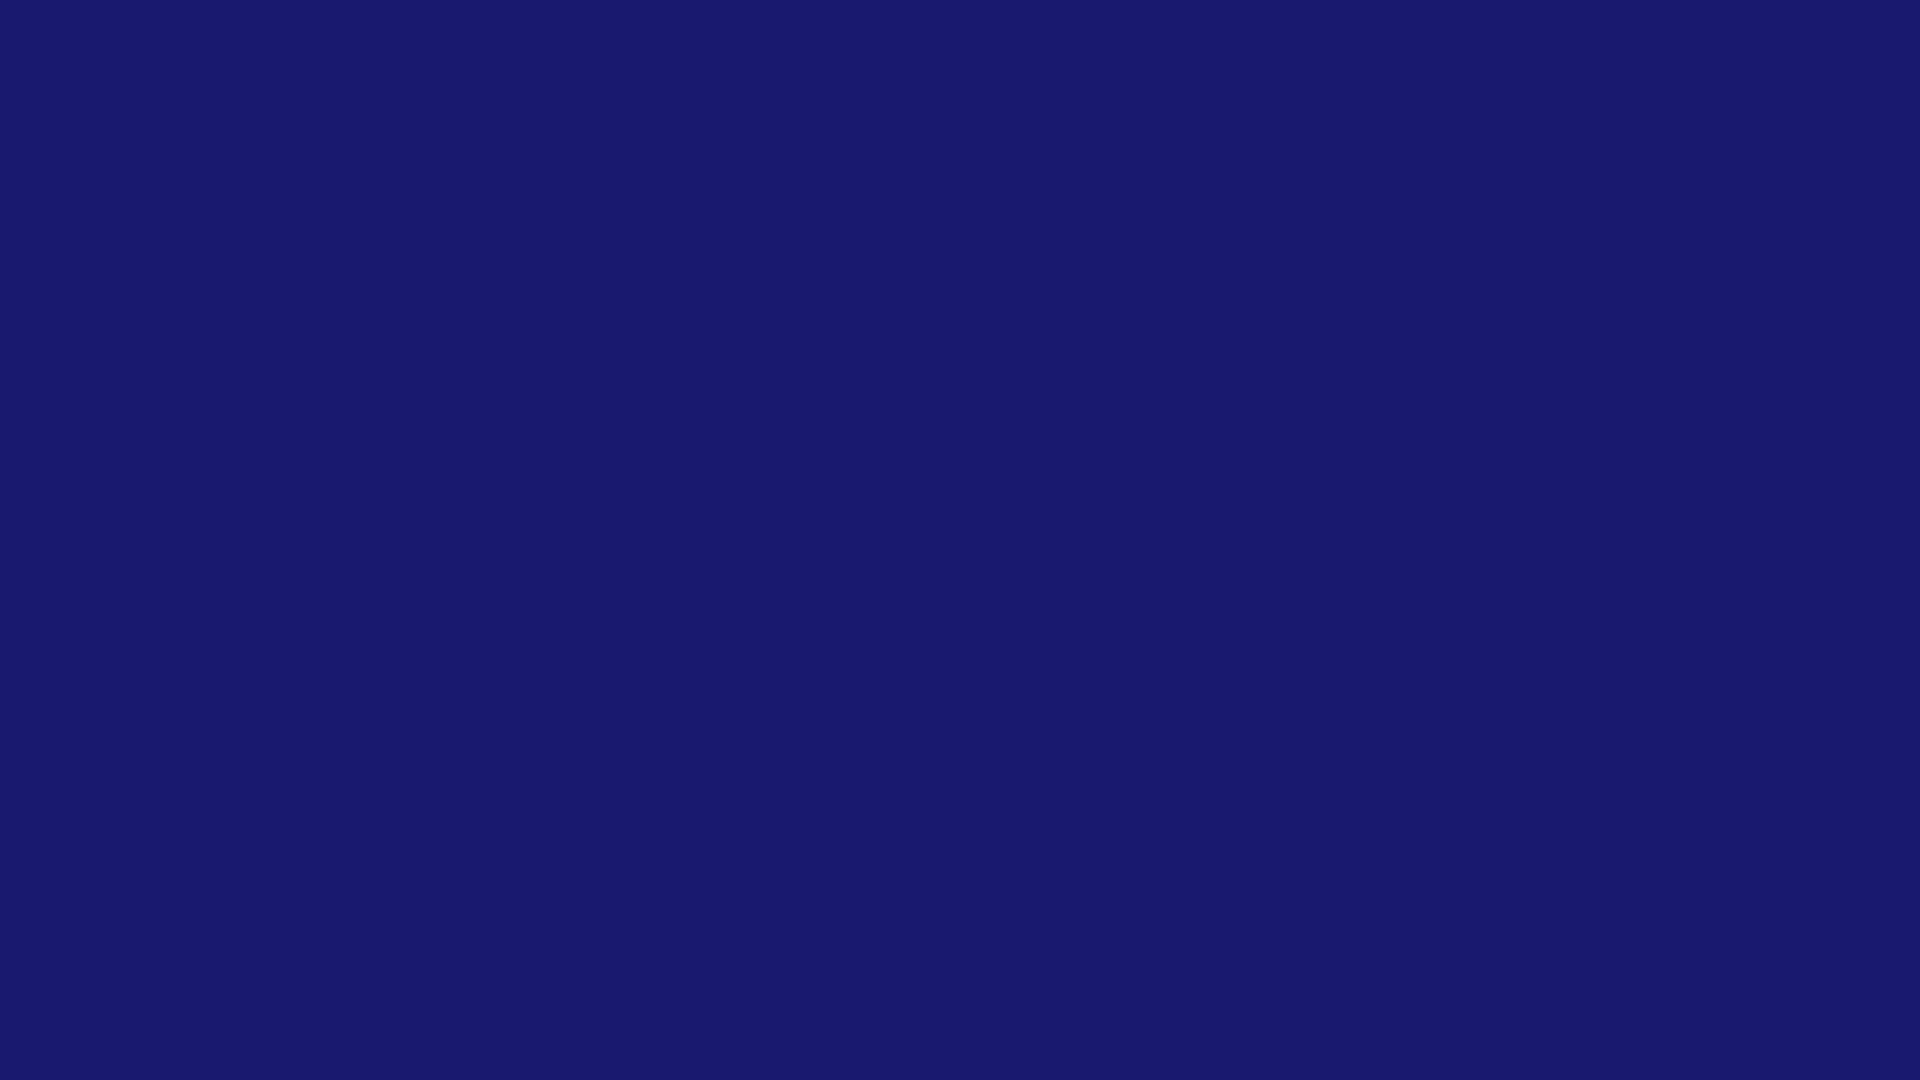 Midnight Blue   Wallpaper High Definition High Quality Widescreen 1920x1080